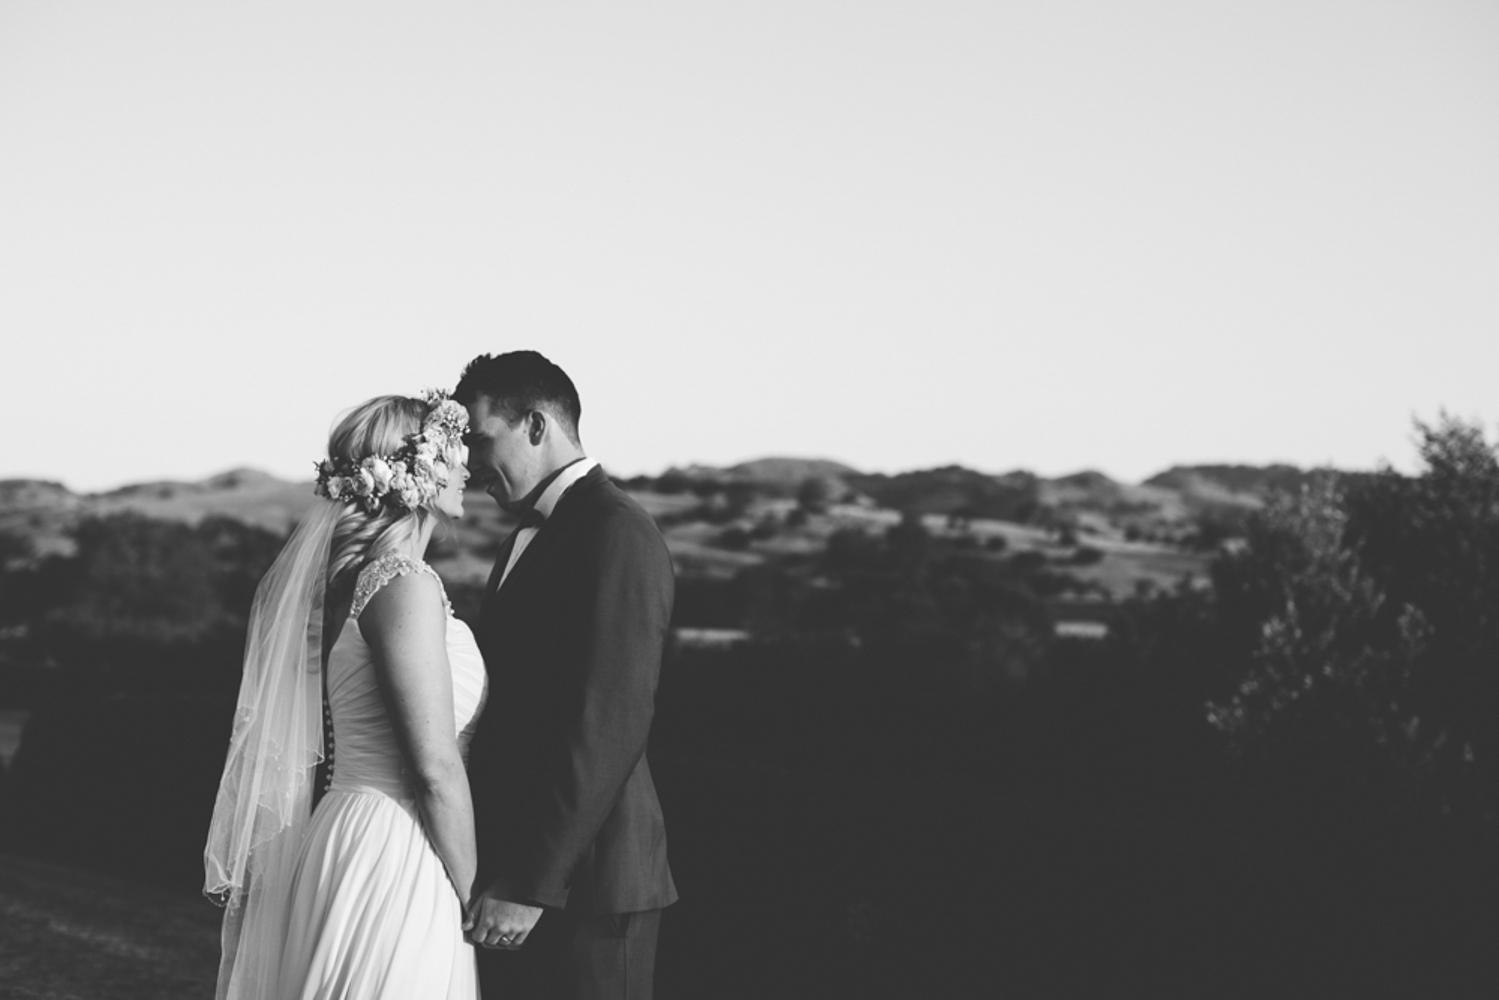 adelaide.hills.vineyard.wedding.south.australia.barossa.valley112.jpeg